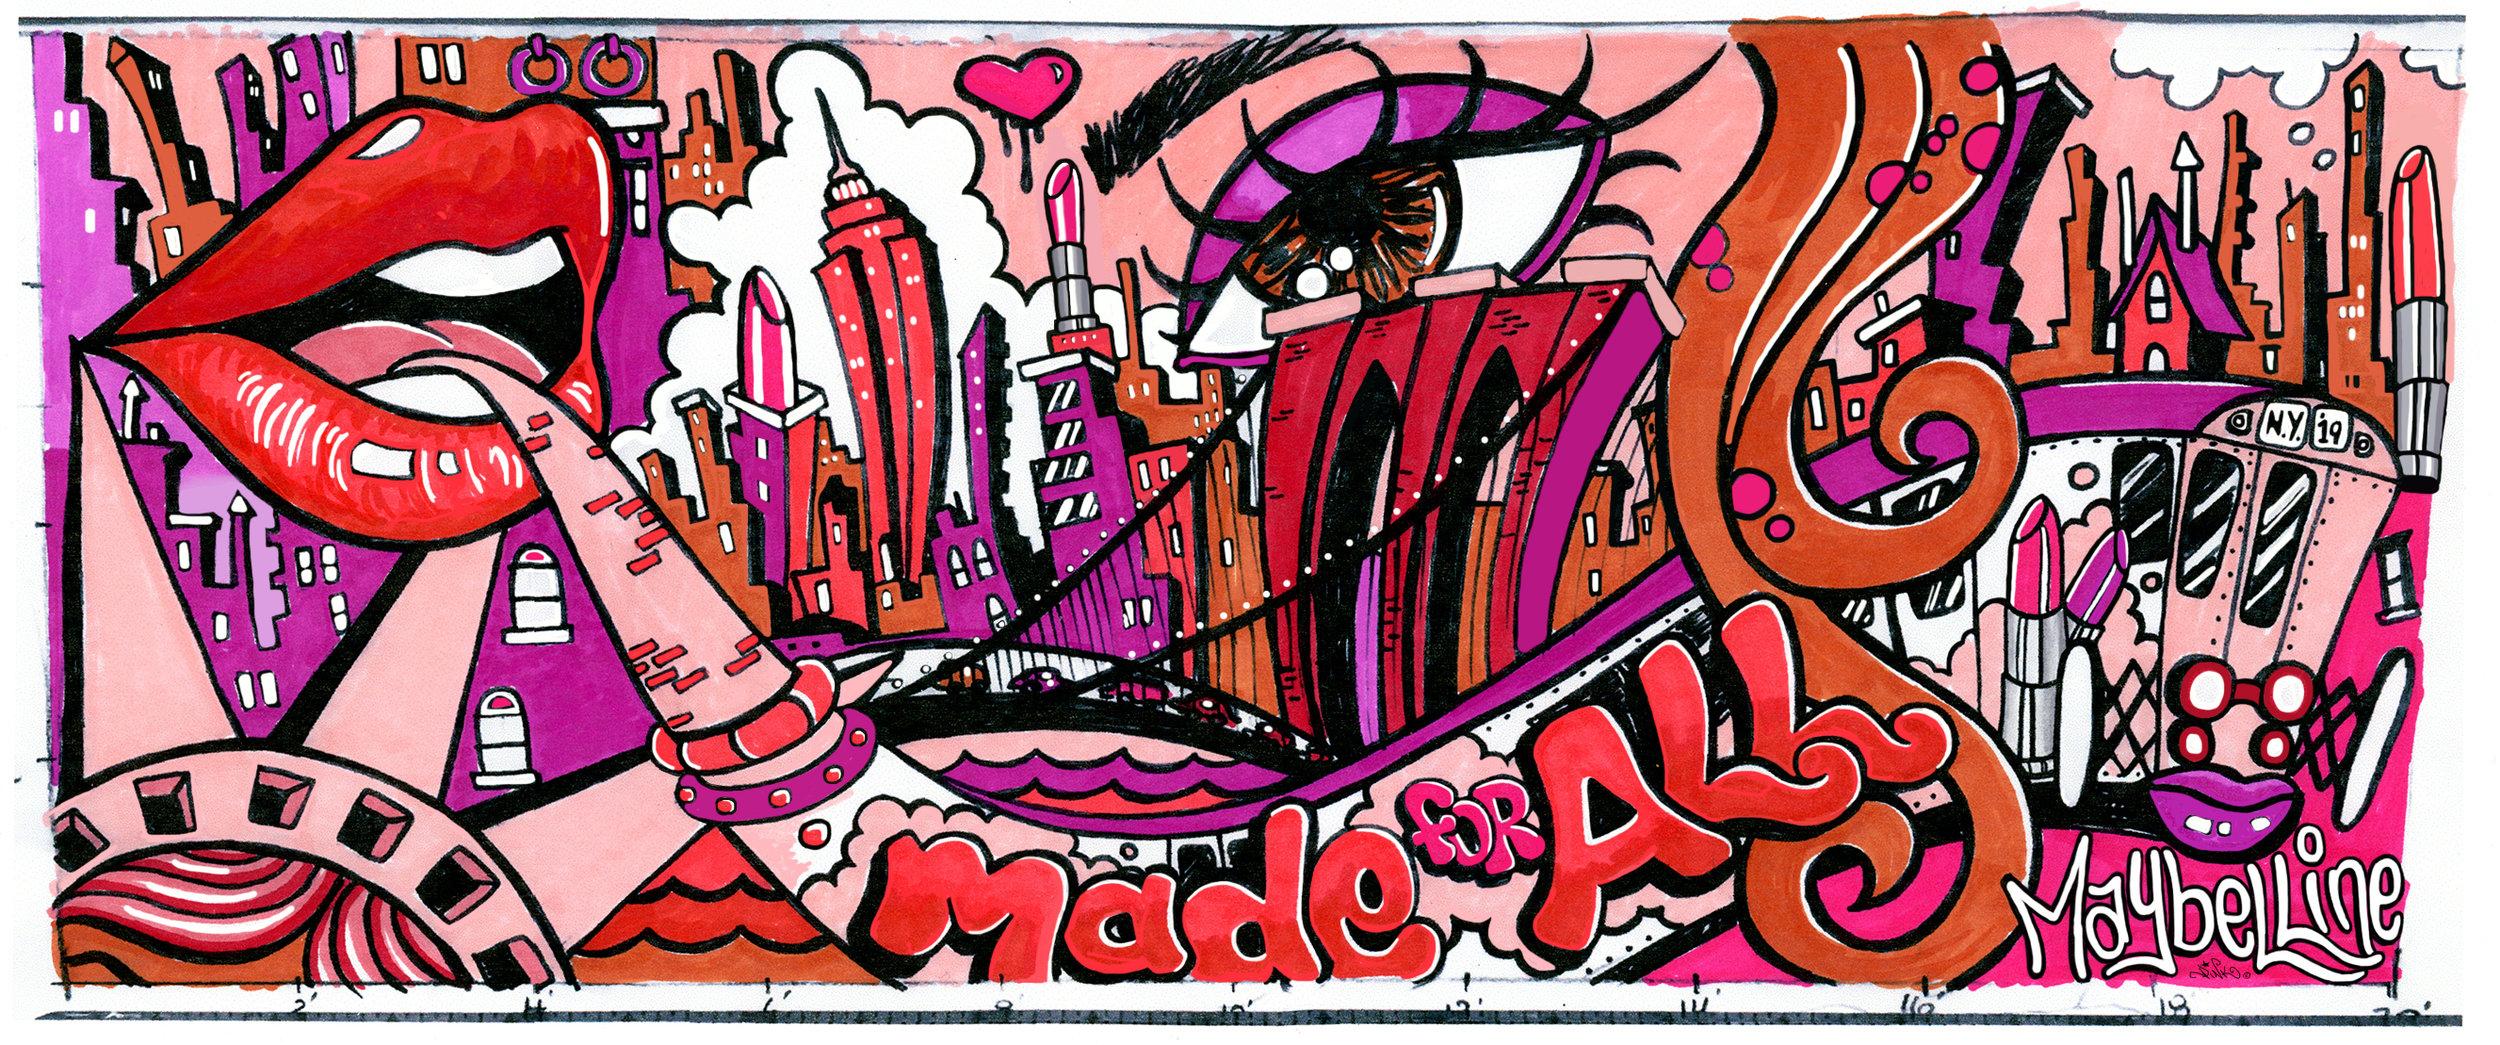 Maybelline5.jpg